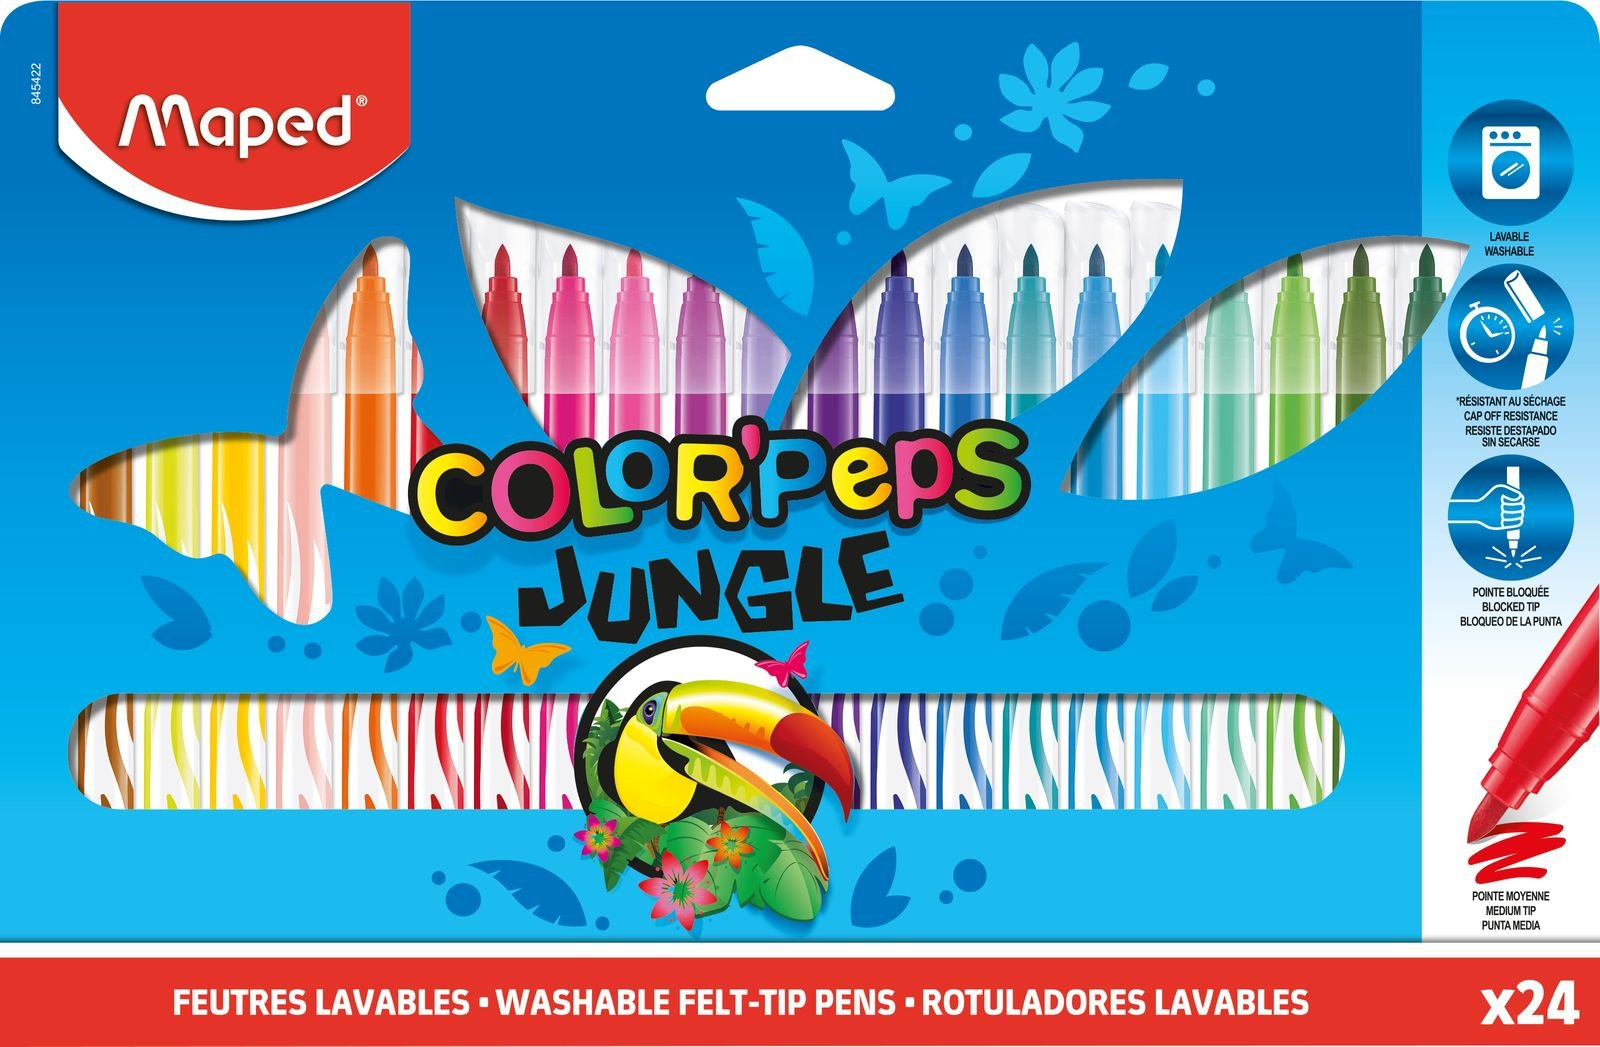 Фломастеры ColorPeps Jungle, 24 шт